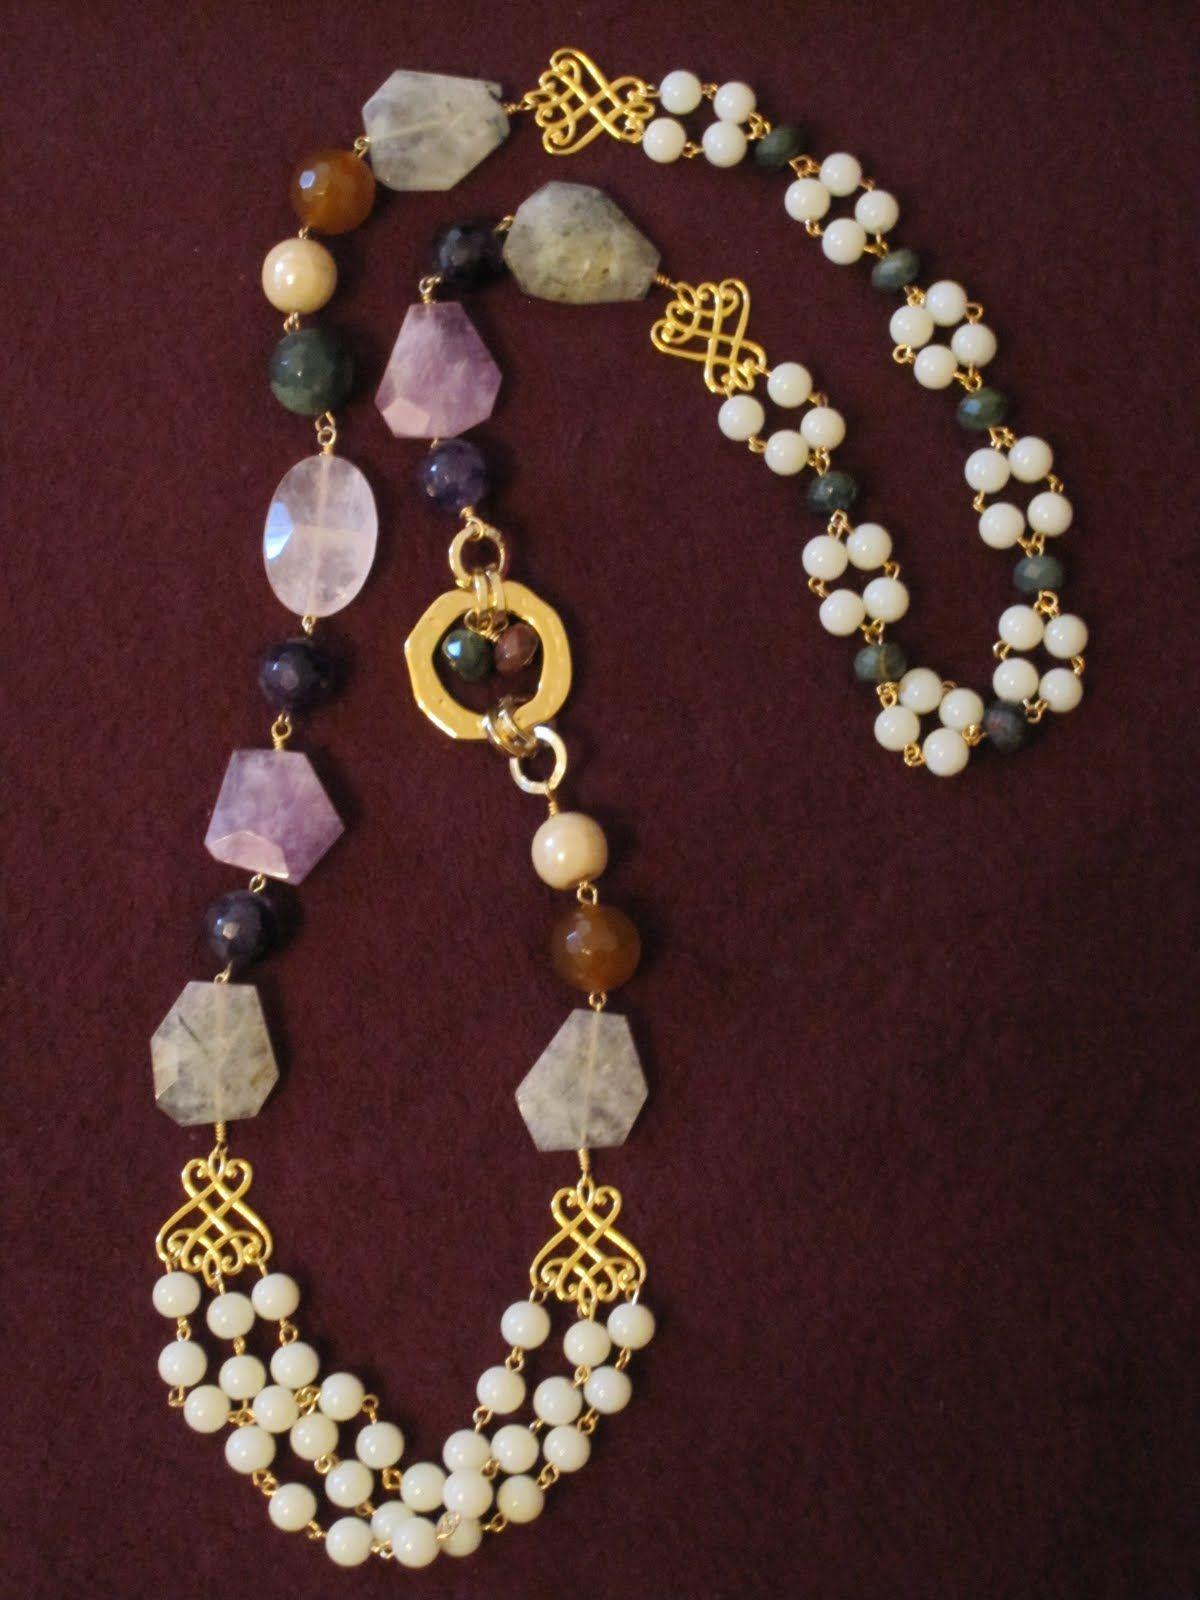 64a543b3 collares de piedras de bisuteria - Buscar con Google - Crafting Now ...